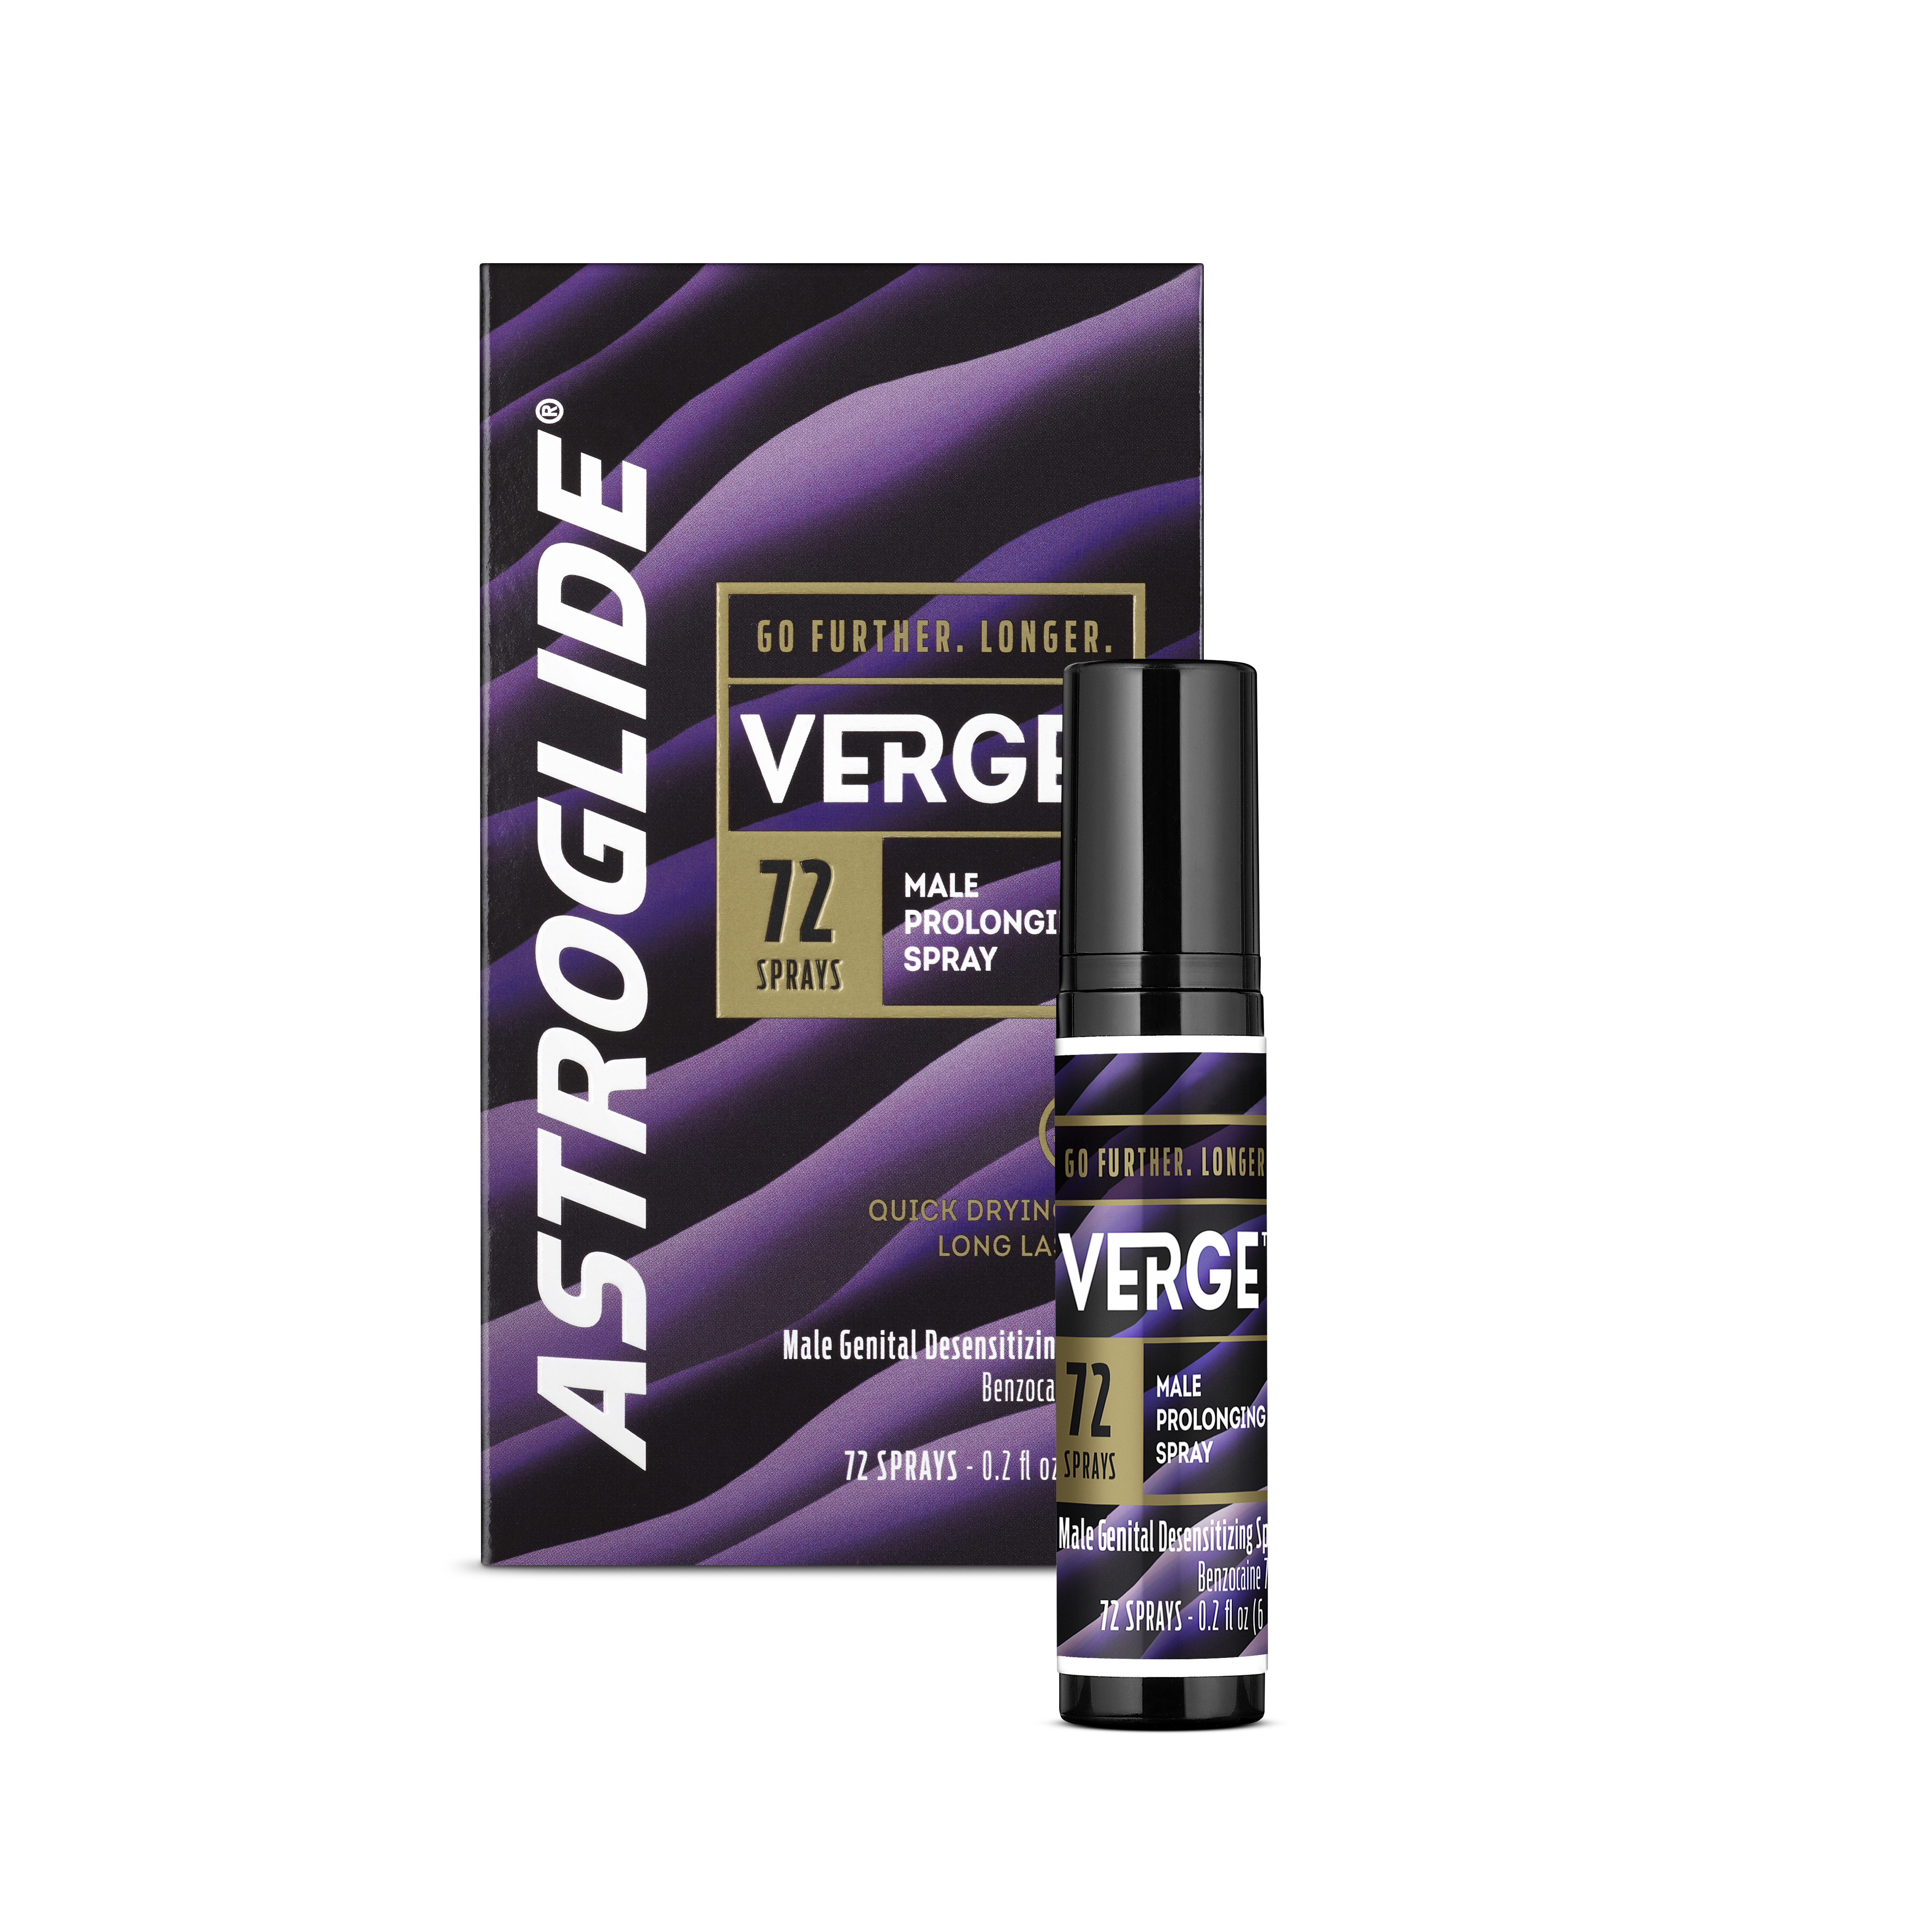 Astroglide Verge Male Prolonging Spray, 0.2oz